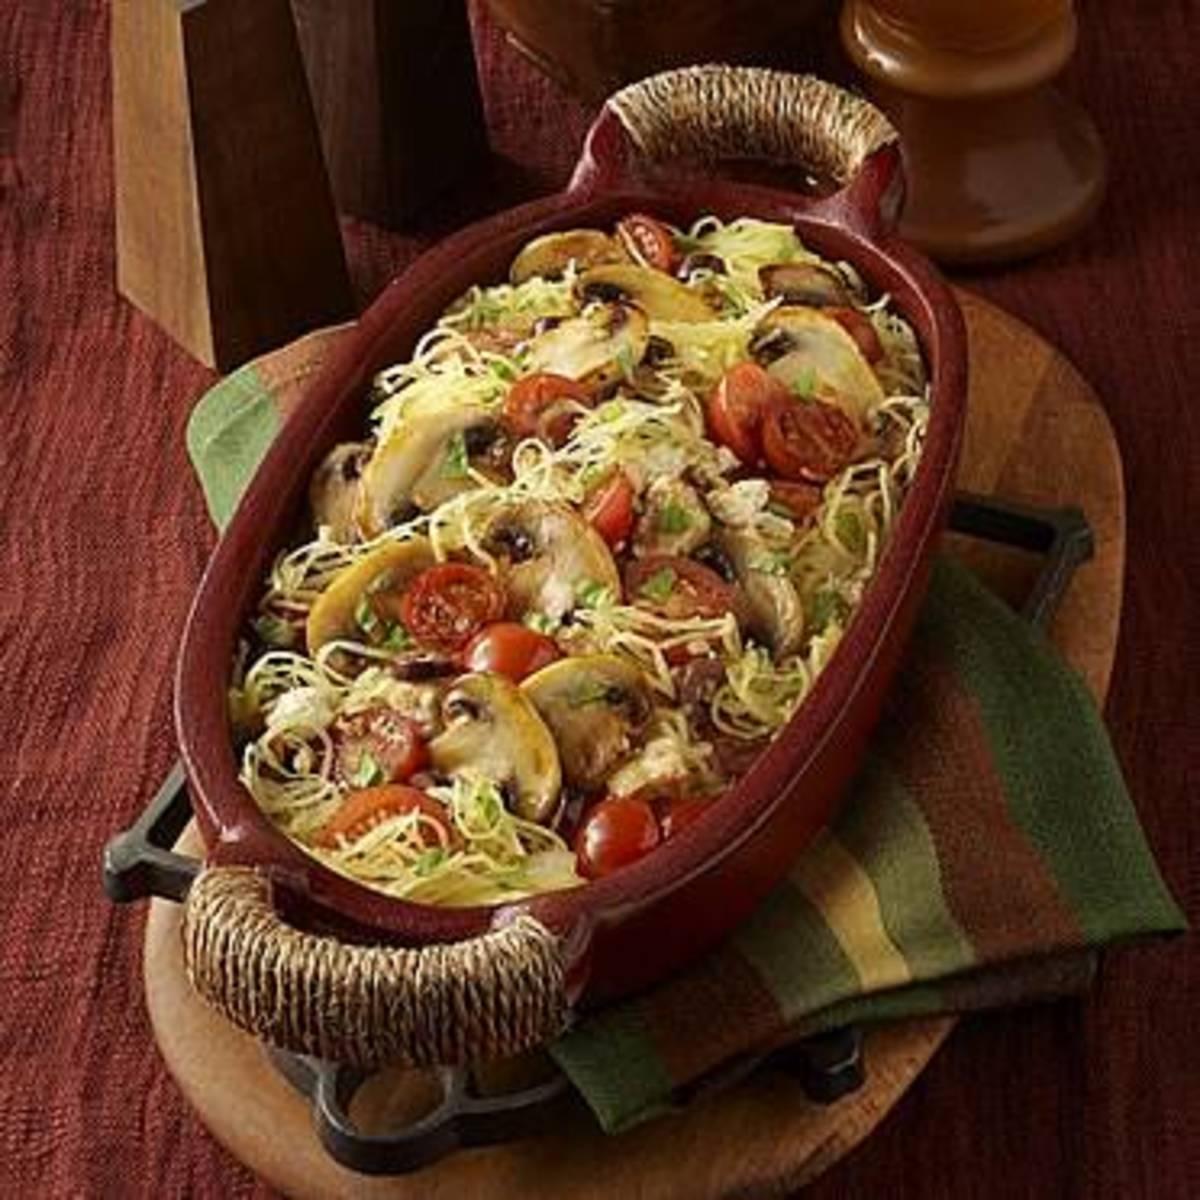 Mushroom Primavera with Spaghetti Squash